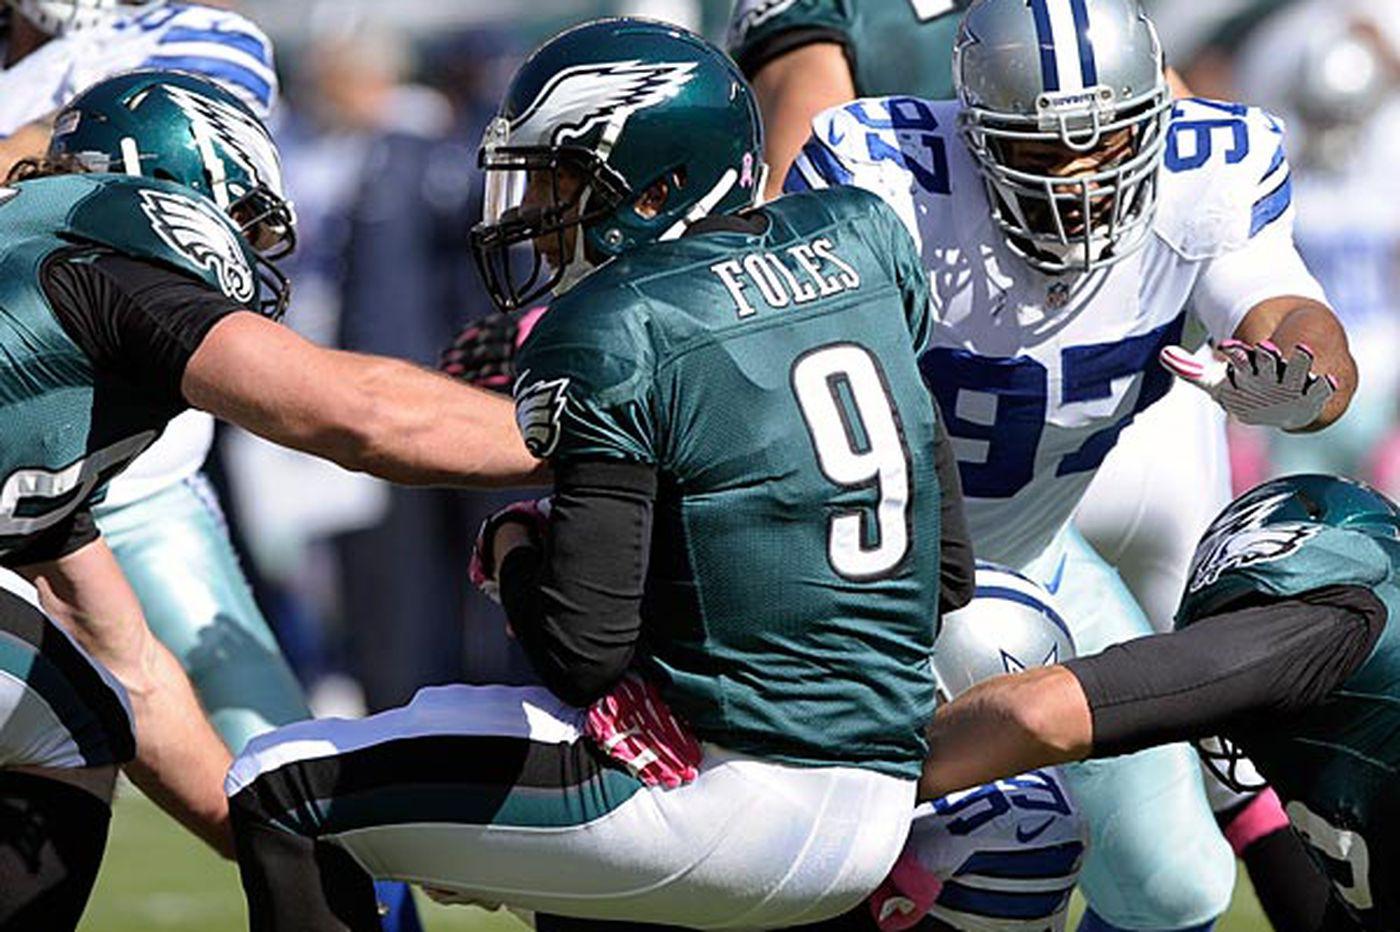 Eagles' Nick Foles says he didn't choke against Dallas, trusts Kelly, God